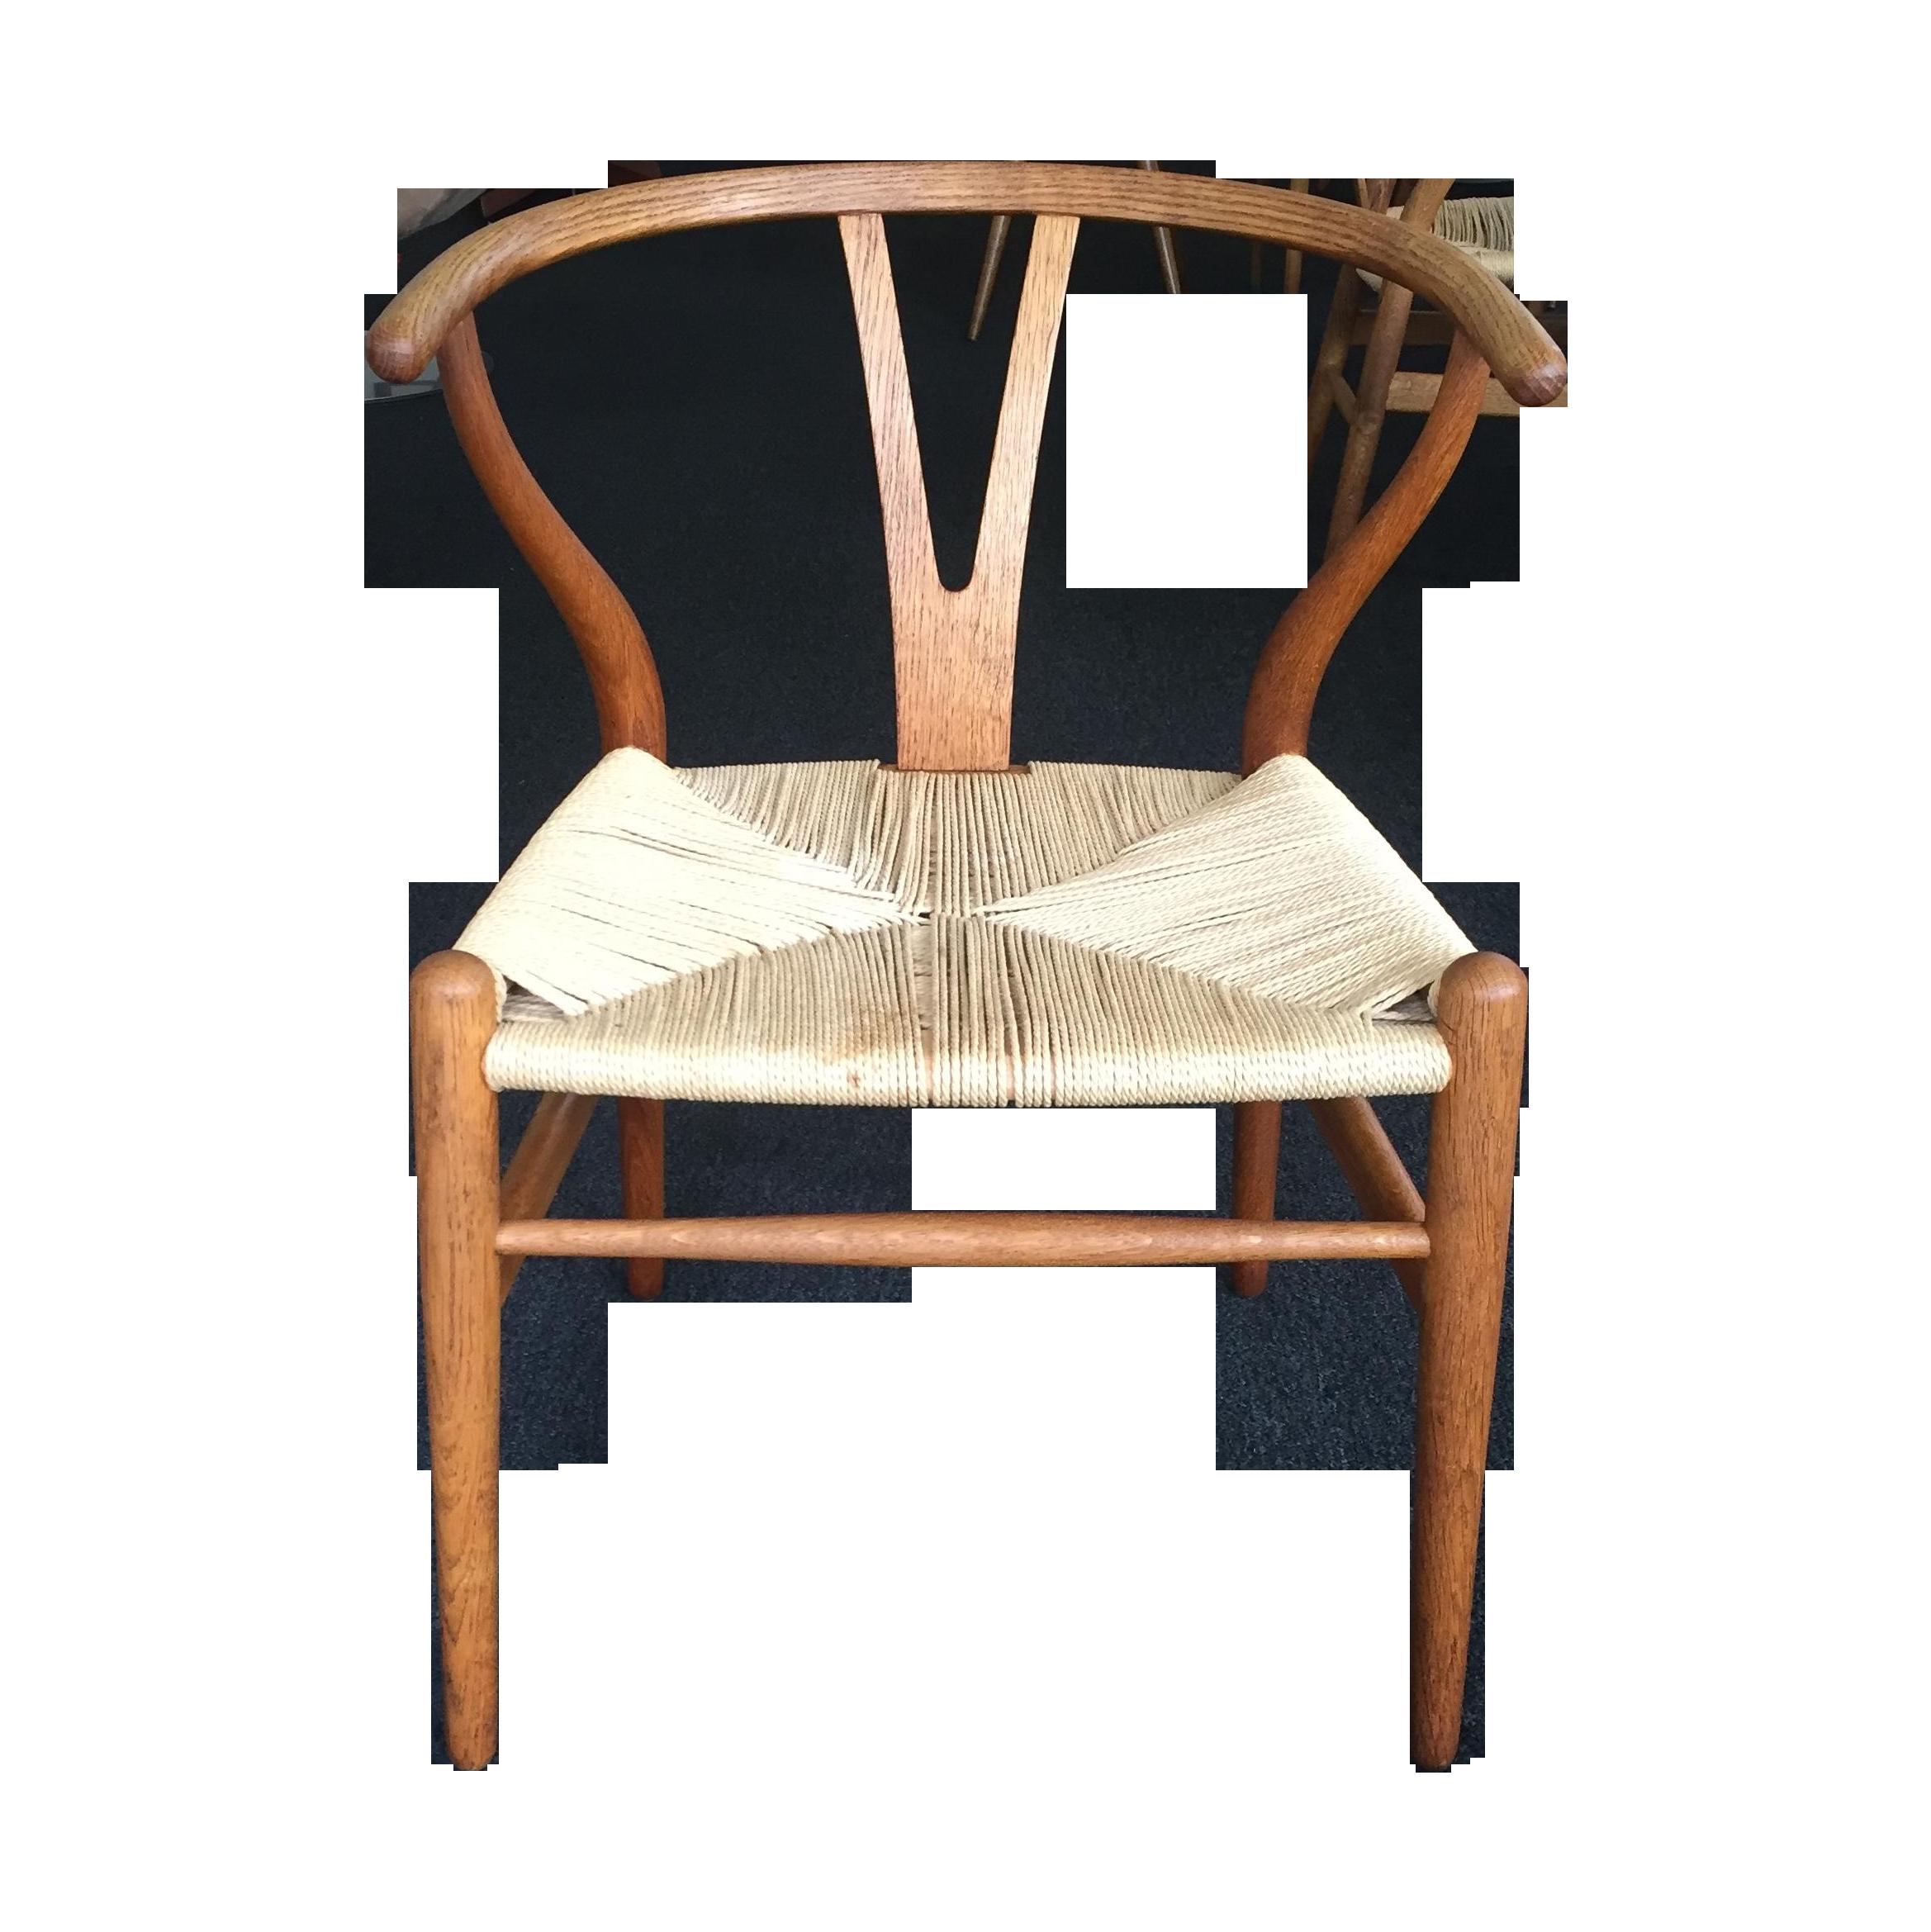 hans wegner vintage wishbone chairs set of 4 chairish. Black Bedroom Furniture Sets. Home Design Ideas